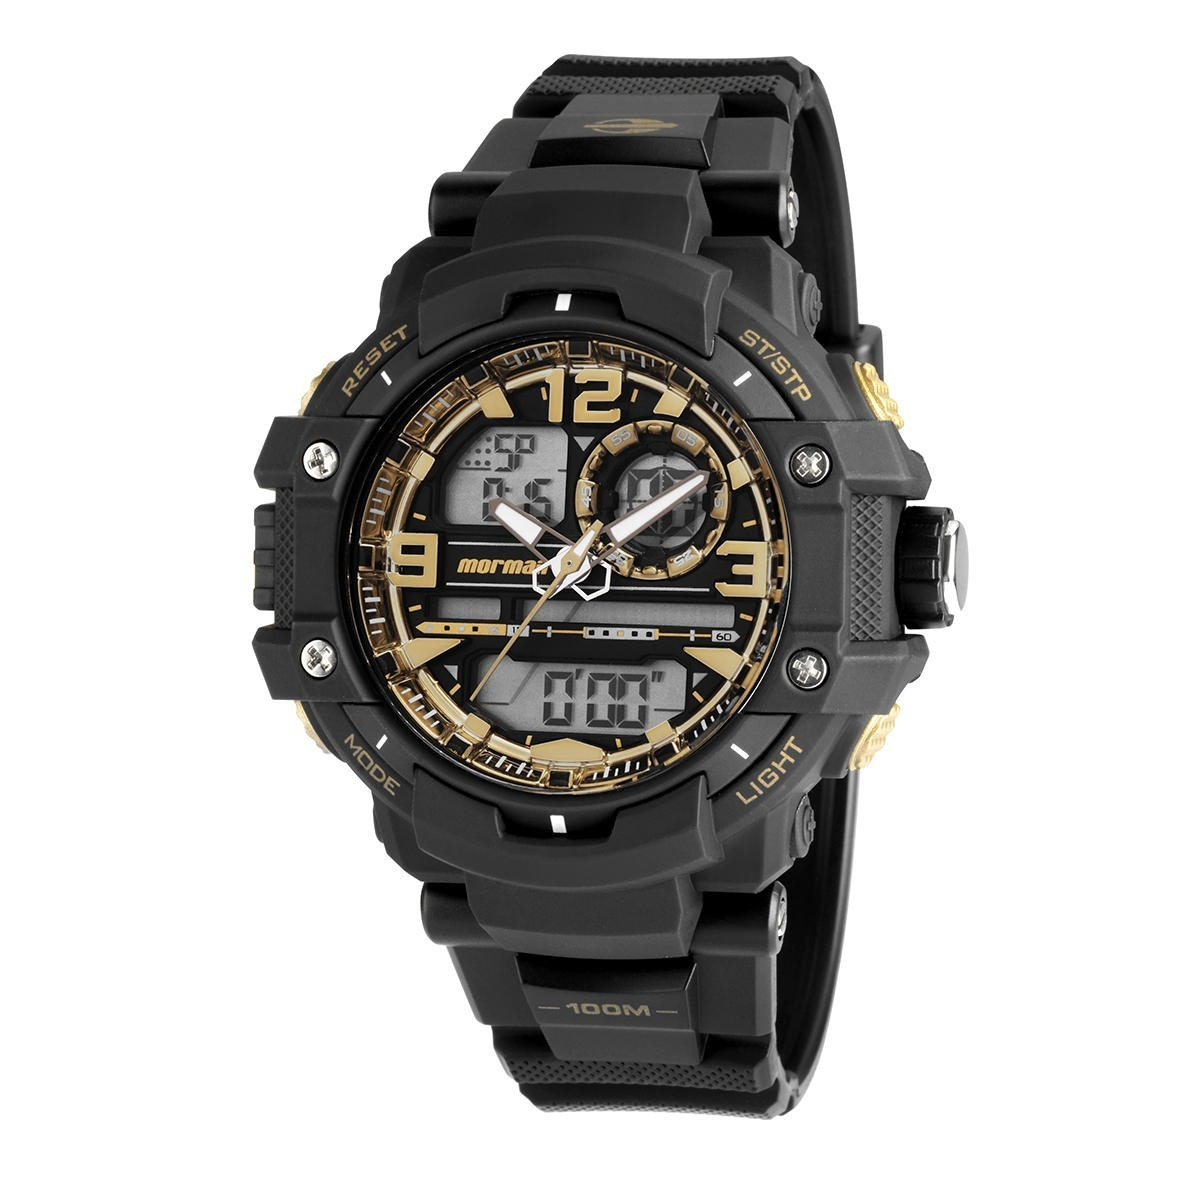 23dba31aee6 relógio masculino mormaii mo0949 8u digital analógico pulso. Carregando  zoom.